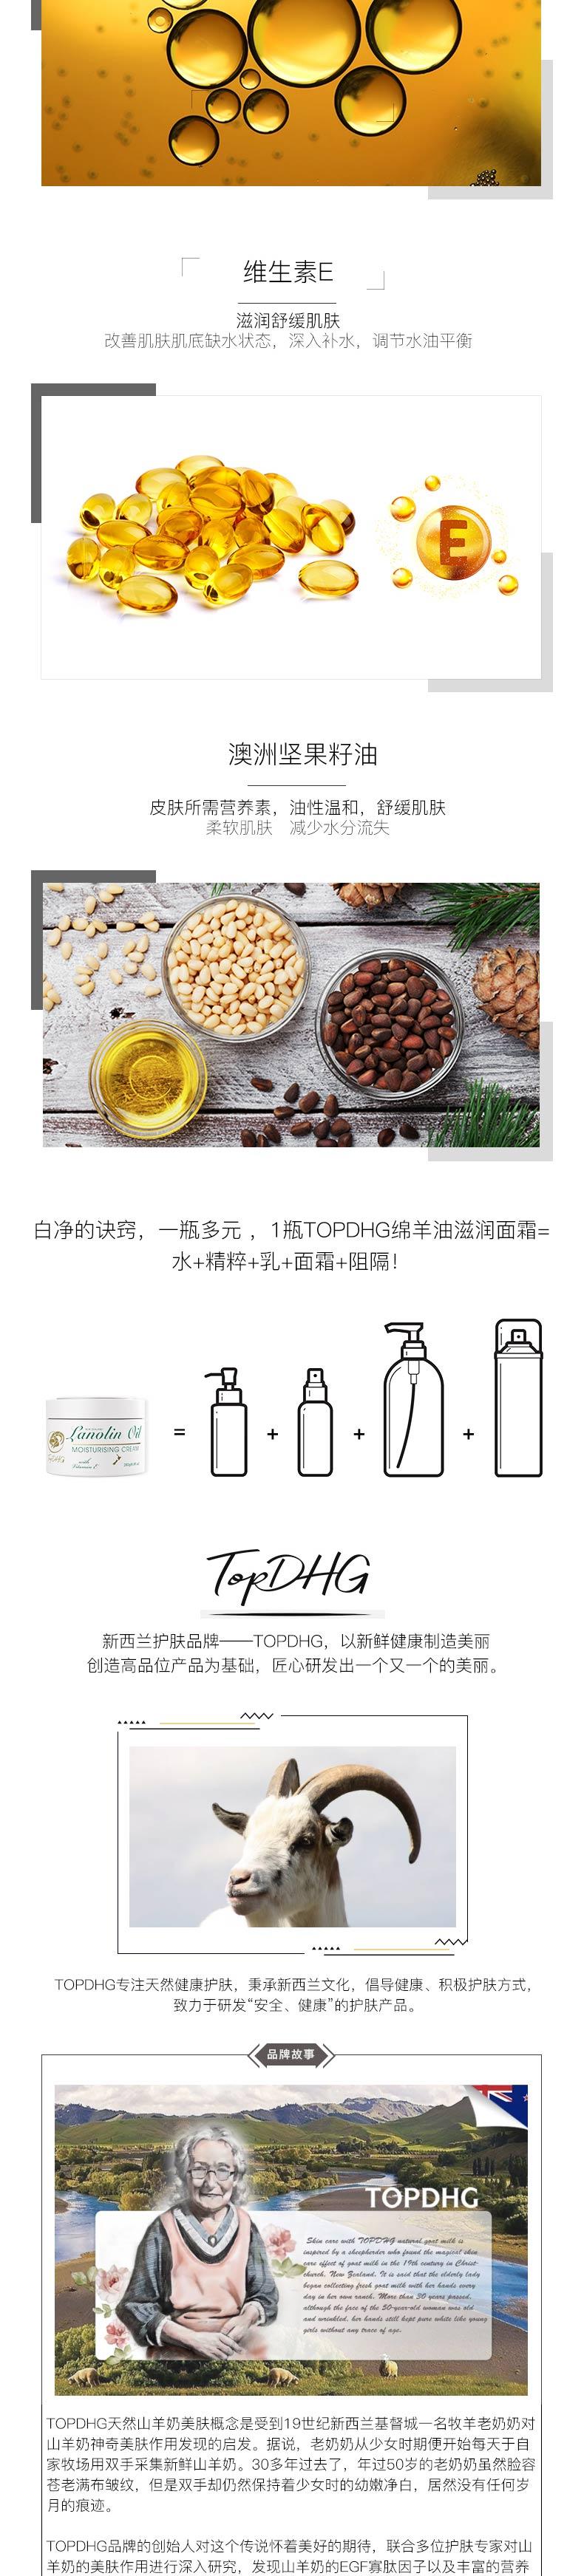 TOPDHG绵羊油_03.jpg